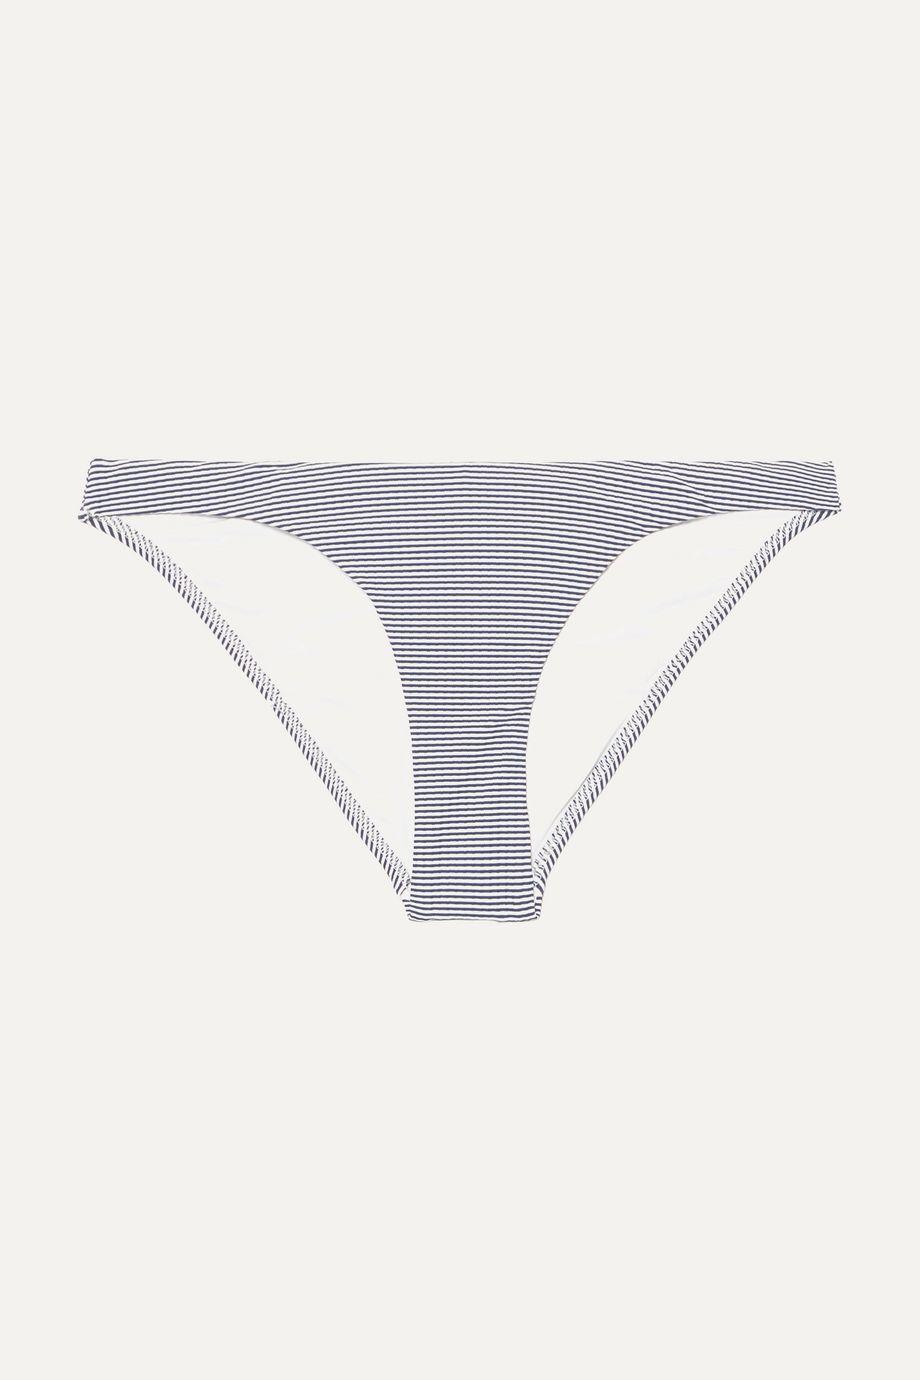 Melissa Odabash St Kitts striped bikini briefs